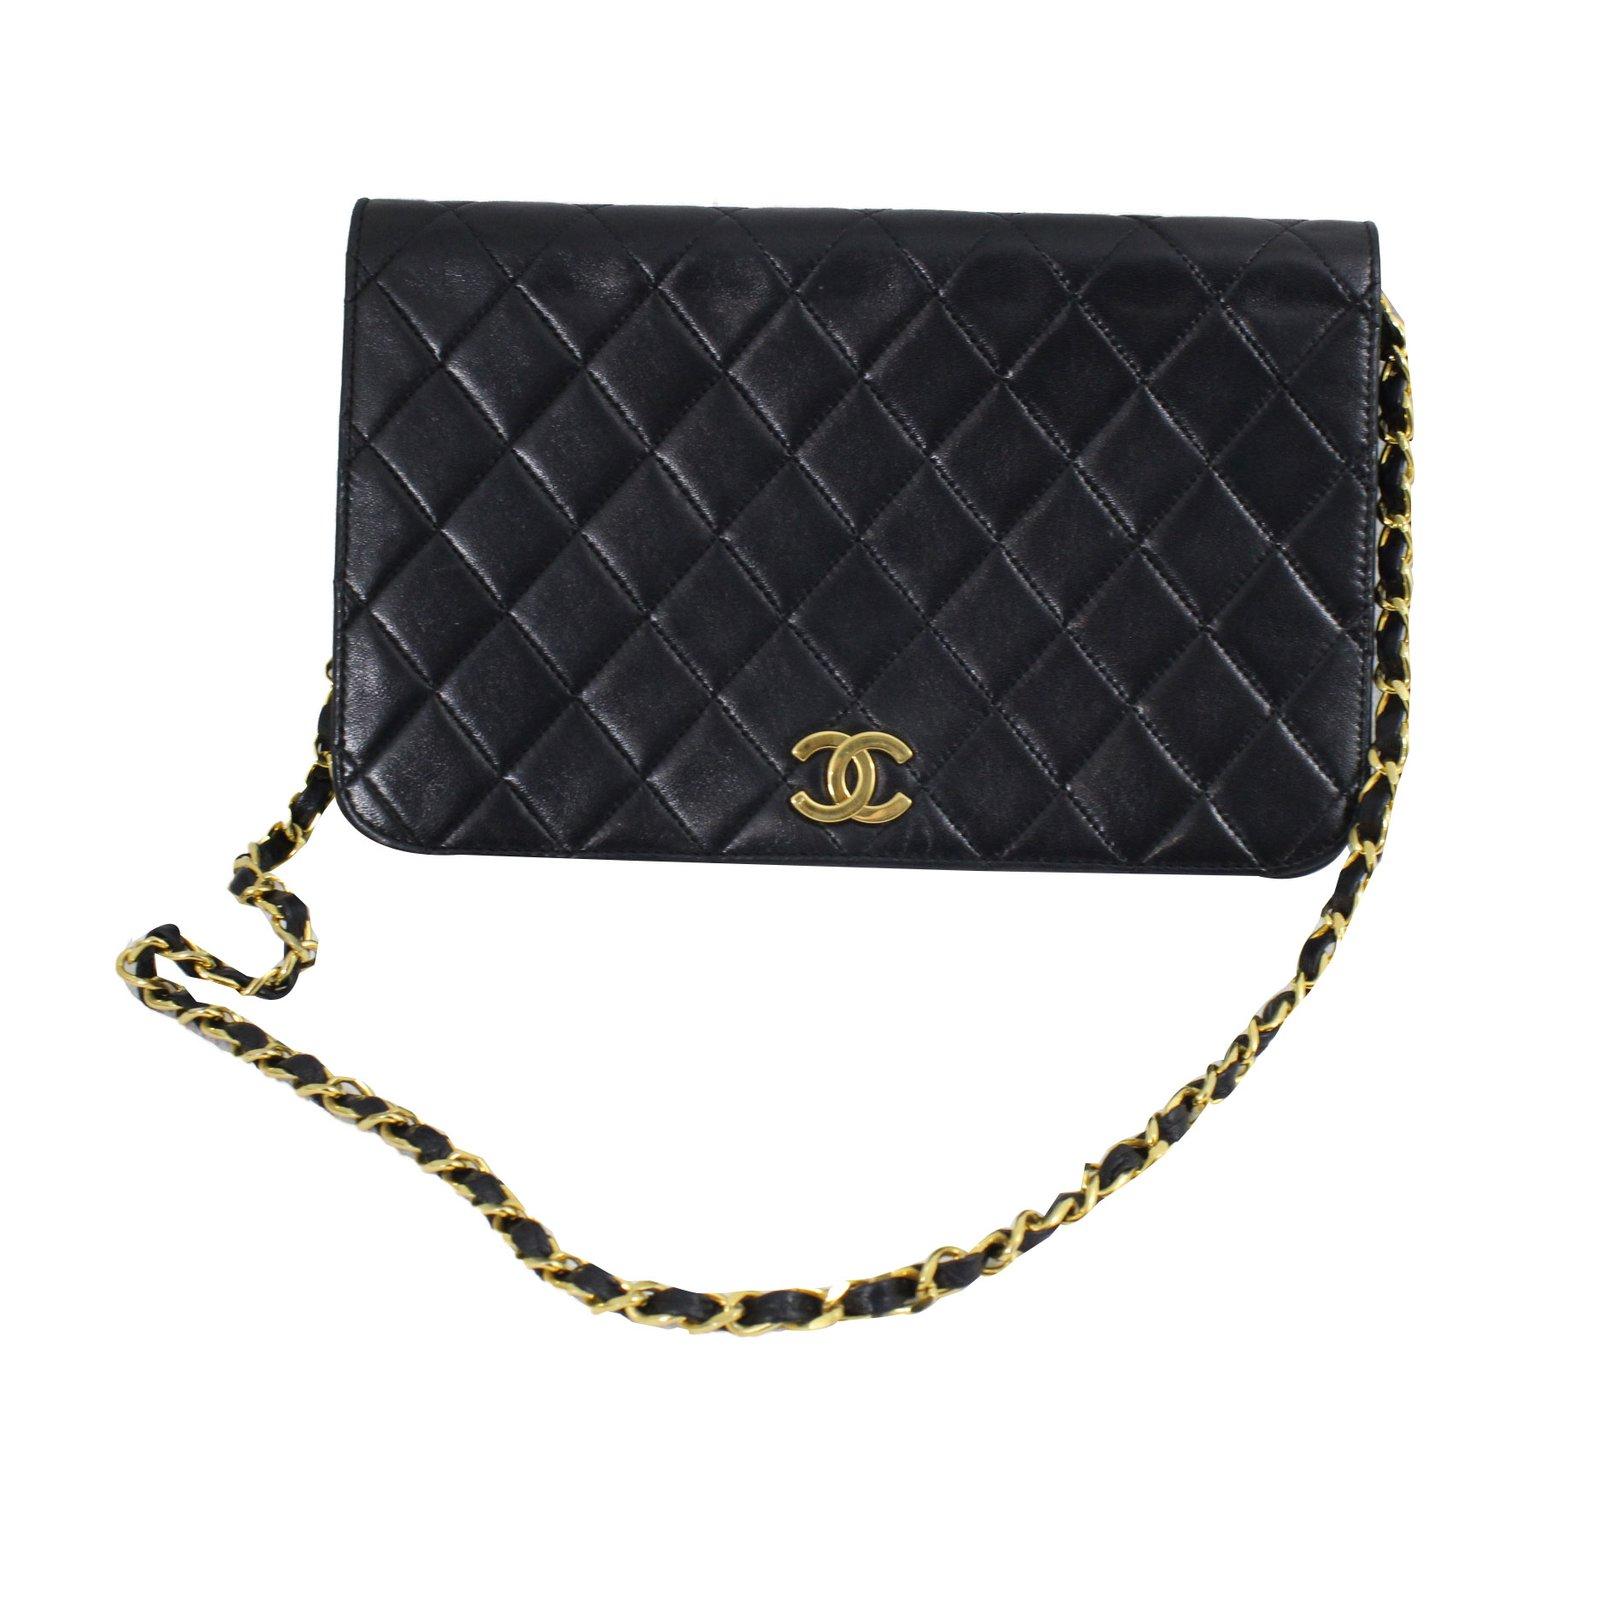 Sacs à main Chanel Sac a main style WOC Cuir vernis Noir ref.49144 ... d5f922787962